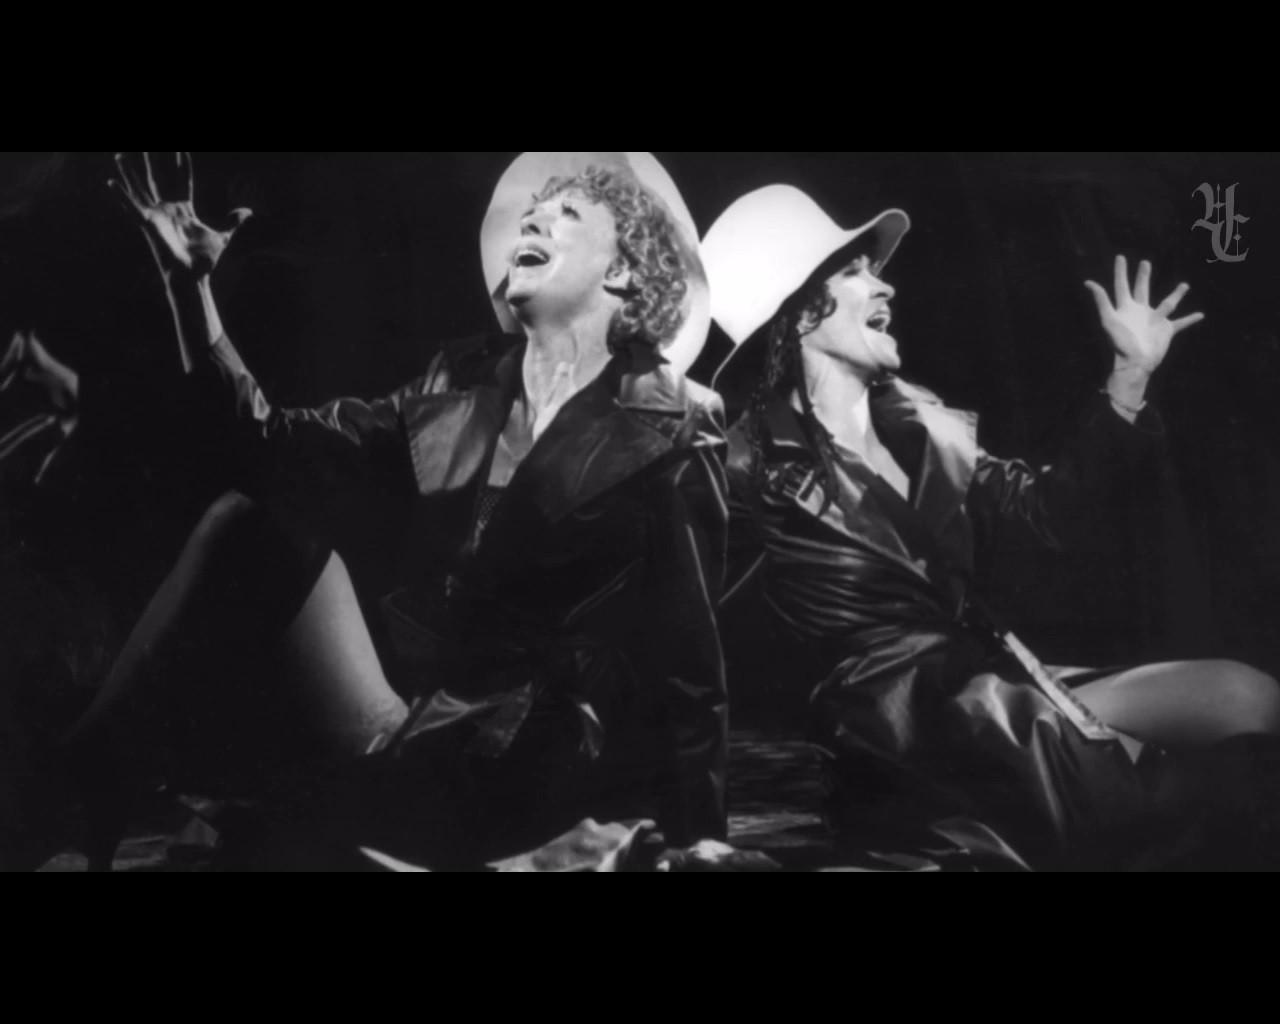 Camila Ashland Porn videos Jane Froman,Luke Evans (born 1979)